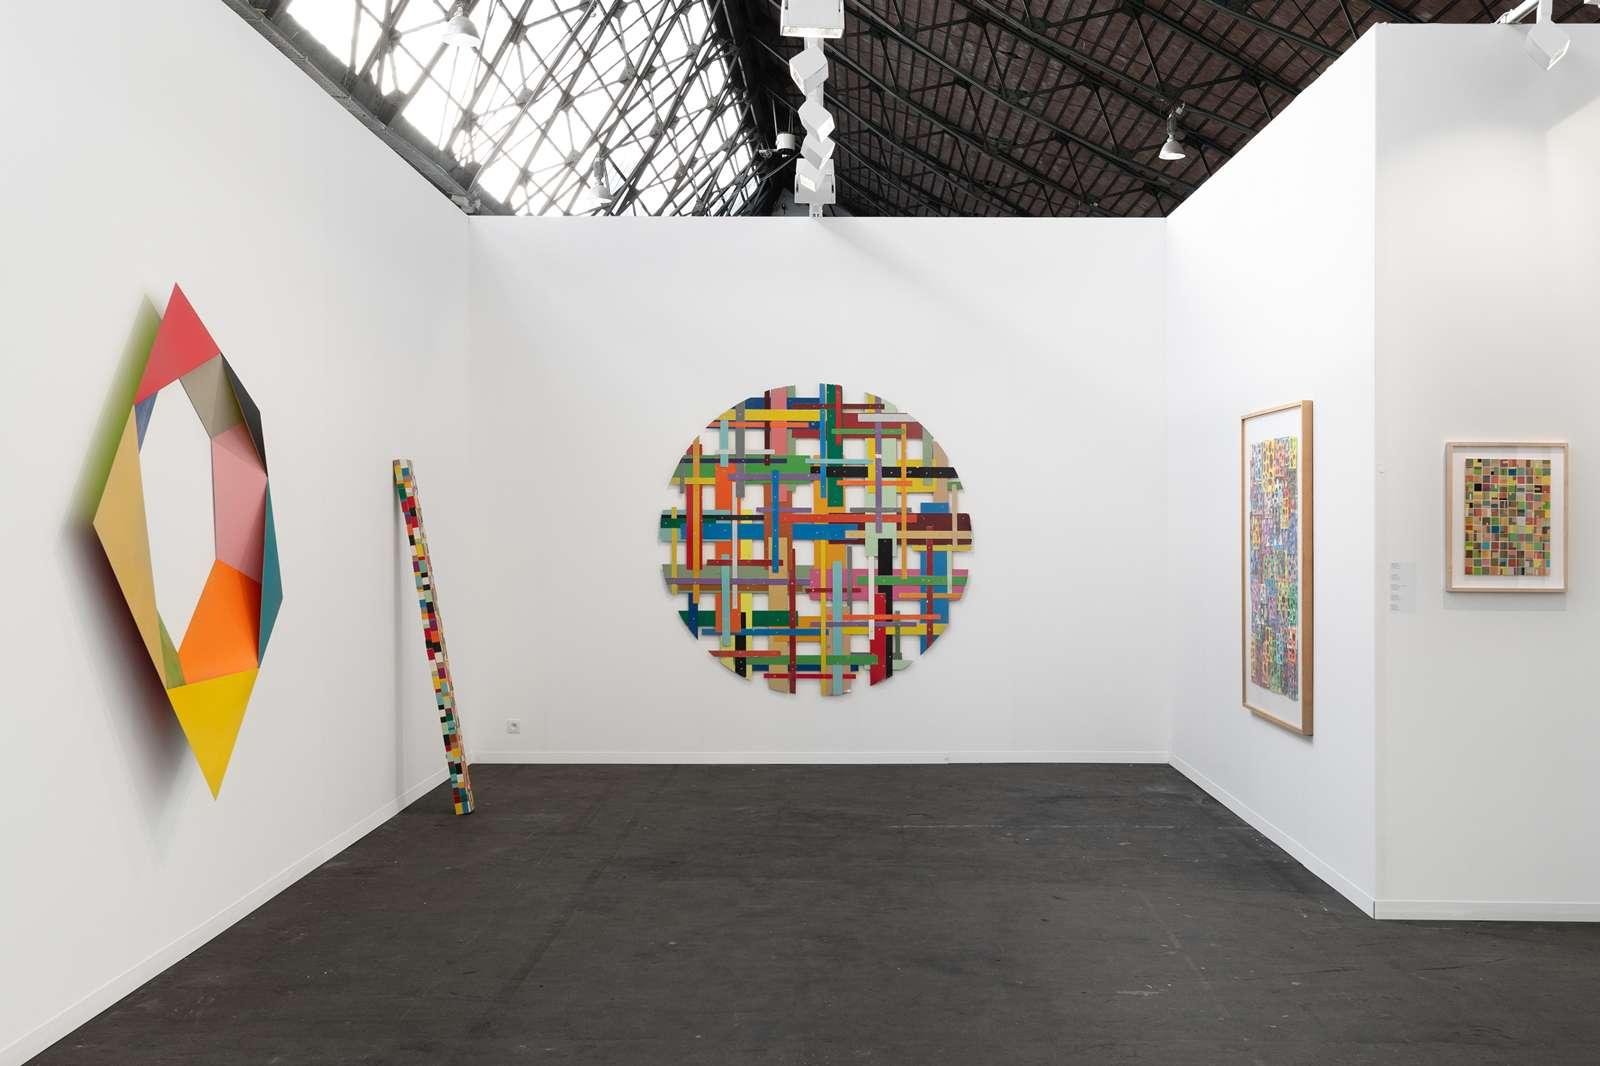 William S. Burroughs, Oli Epp, Françoise Pétrovitch, Présence Panchounette & Beat Zoderer Art Brussels (BE) Semiose 19 — 22 avril 2018